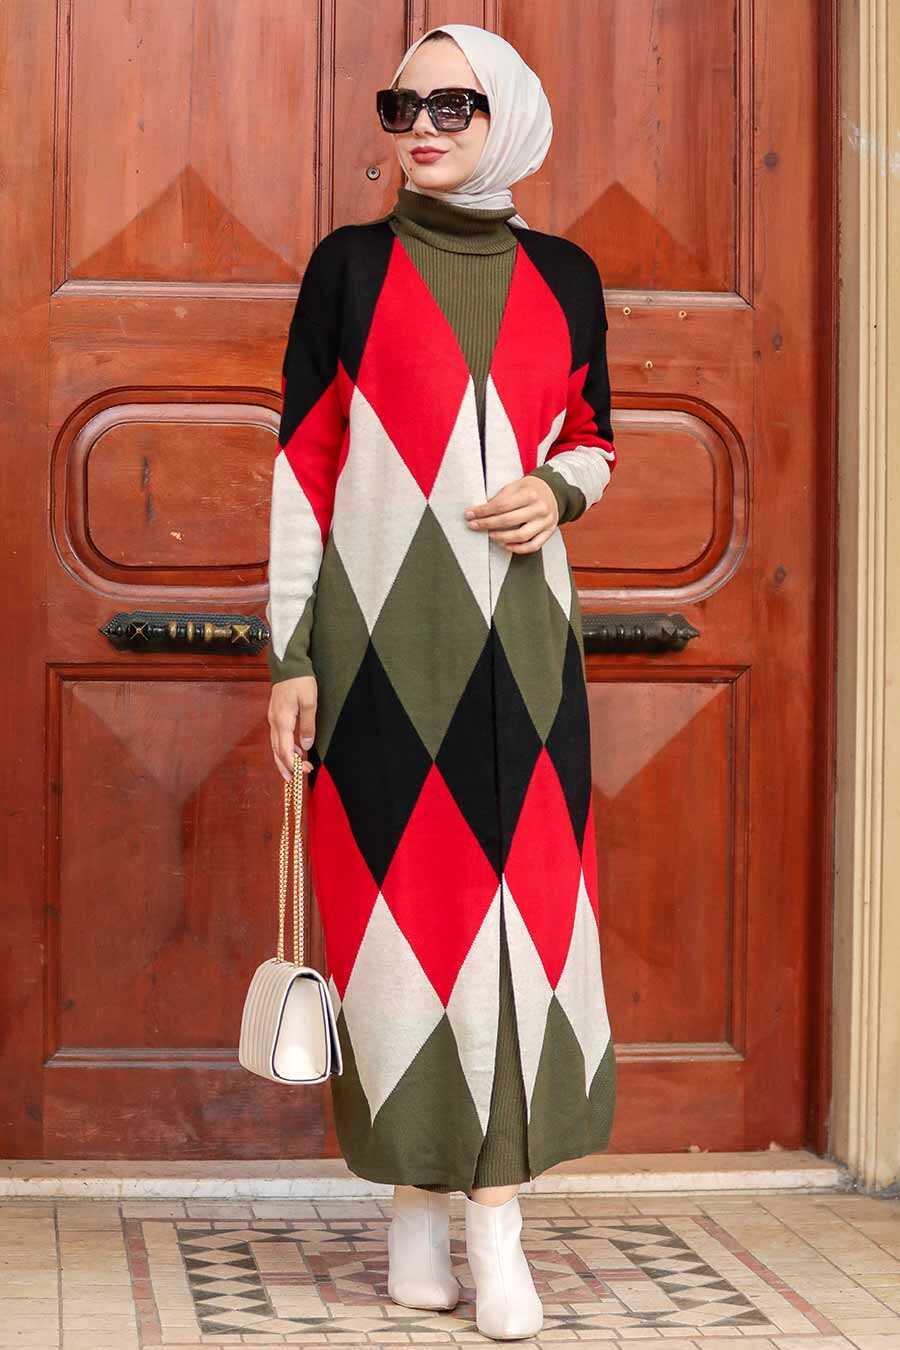 Khaki Hijab Knitwear Suit Dress 3181HK